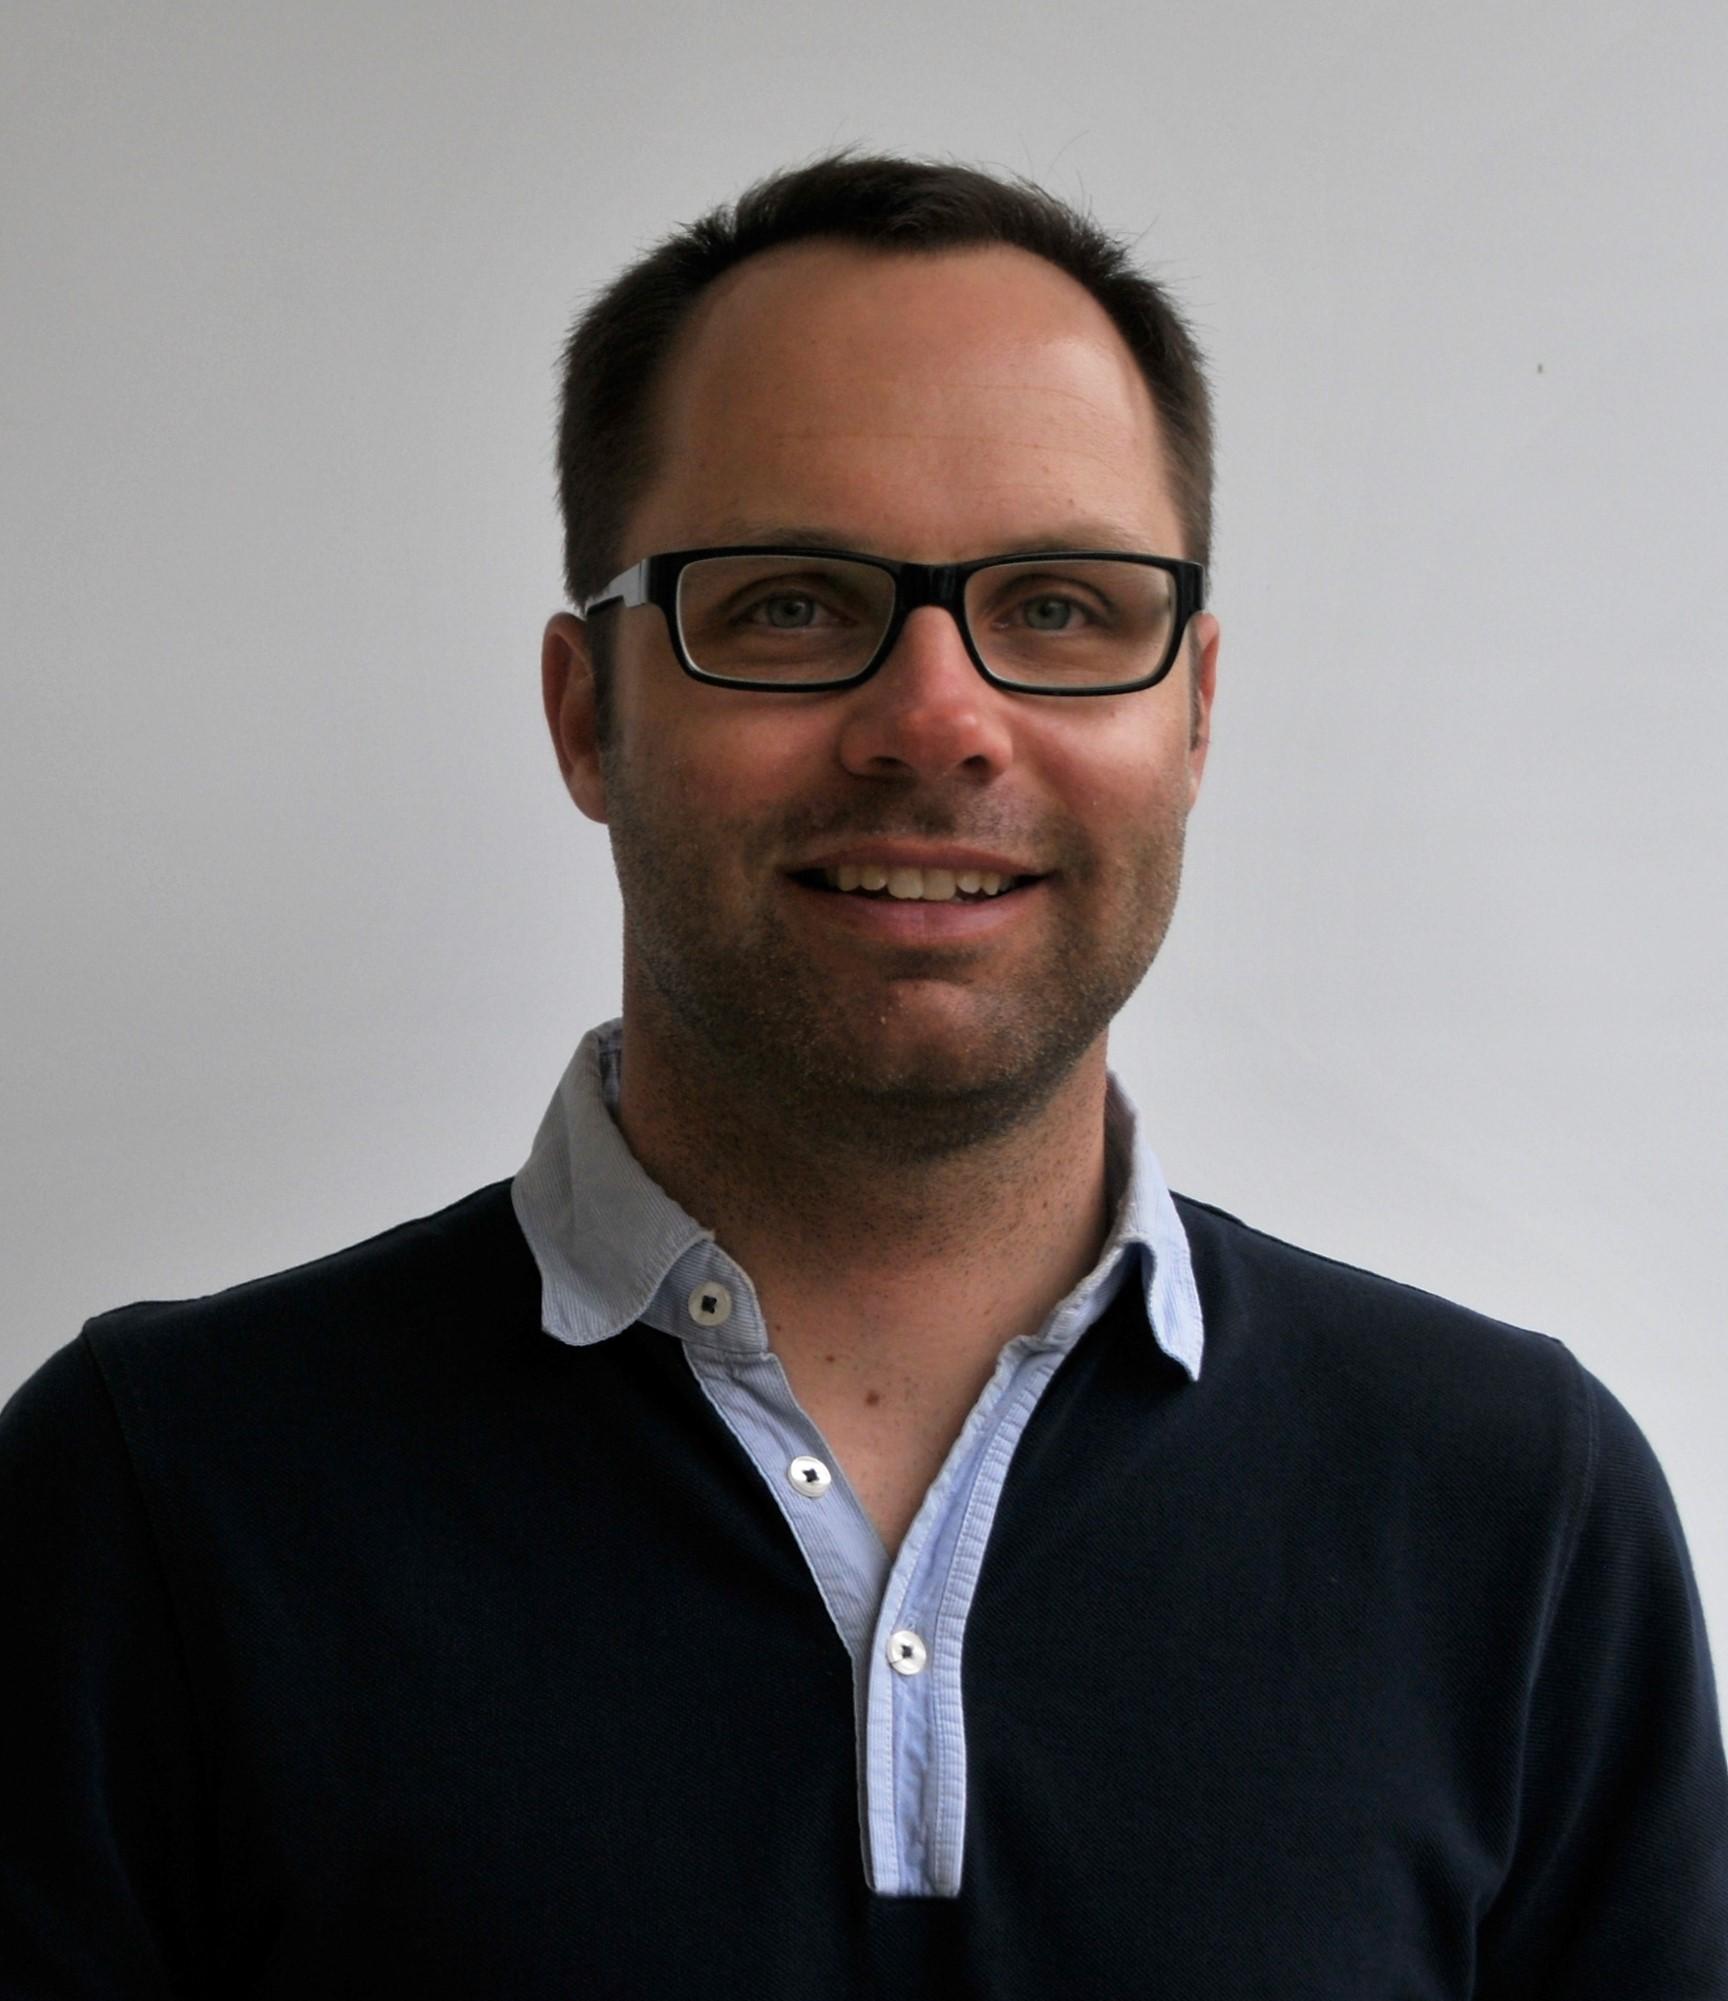 Stefan Niehüser